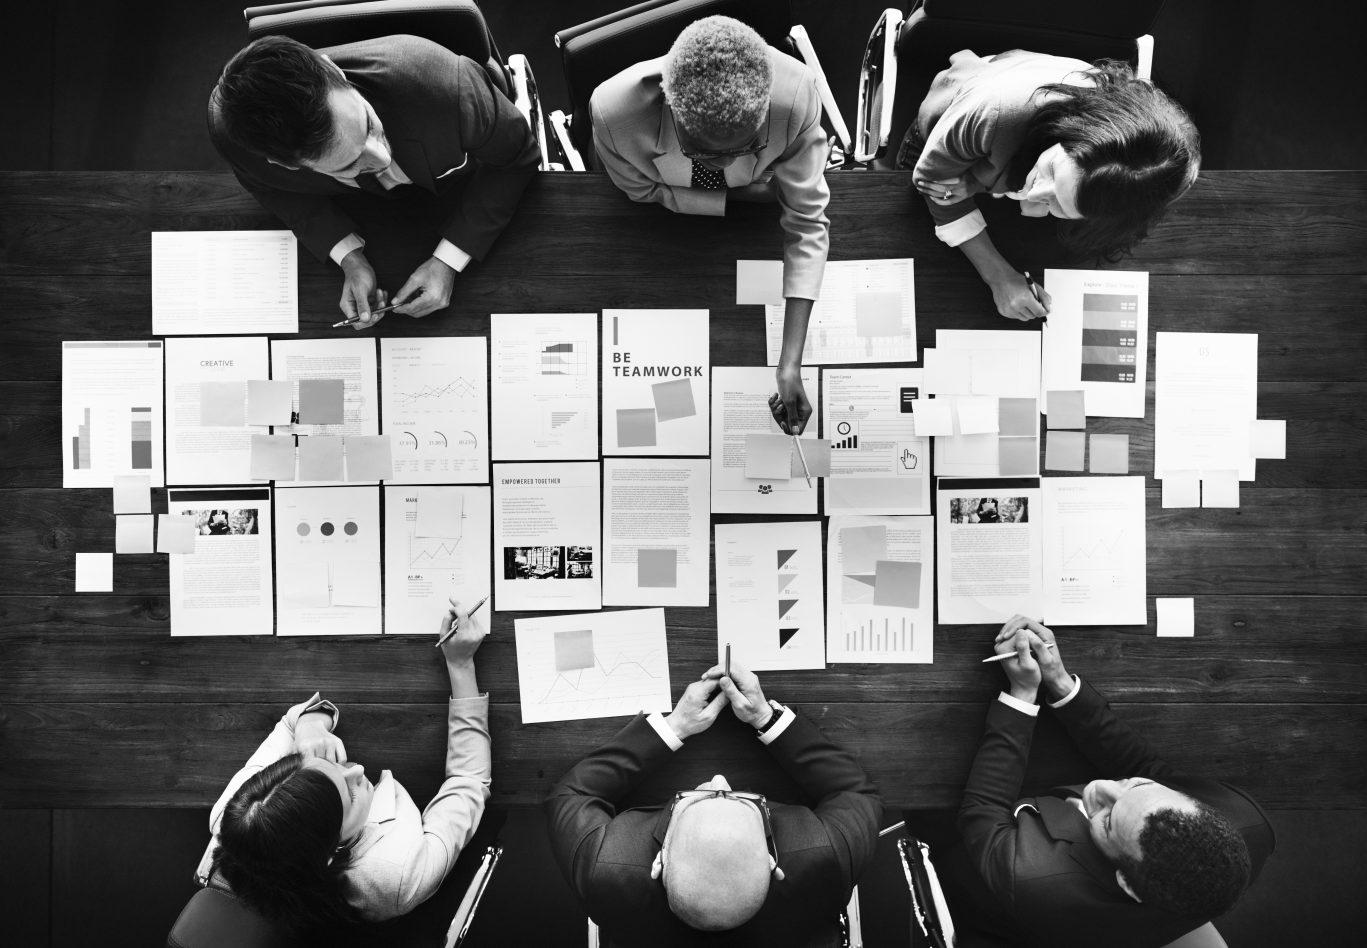 Empreendedorismo: Conheça os 7 principais mitos sobre empreender